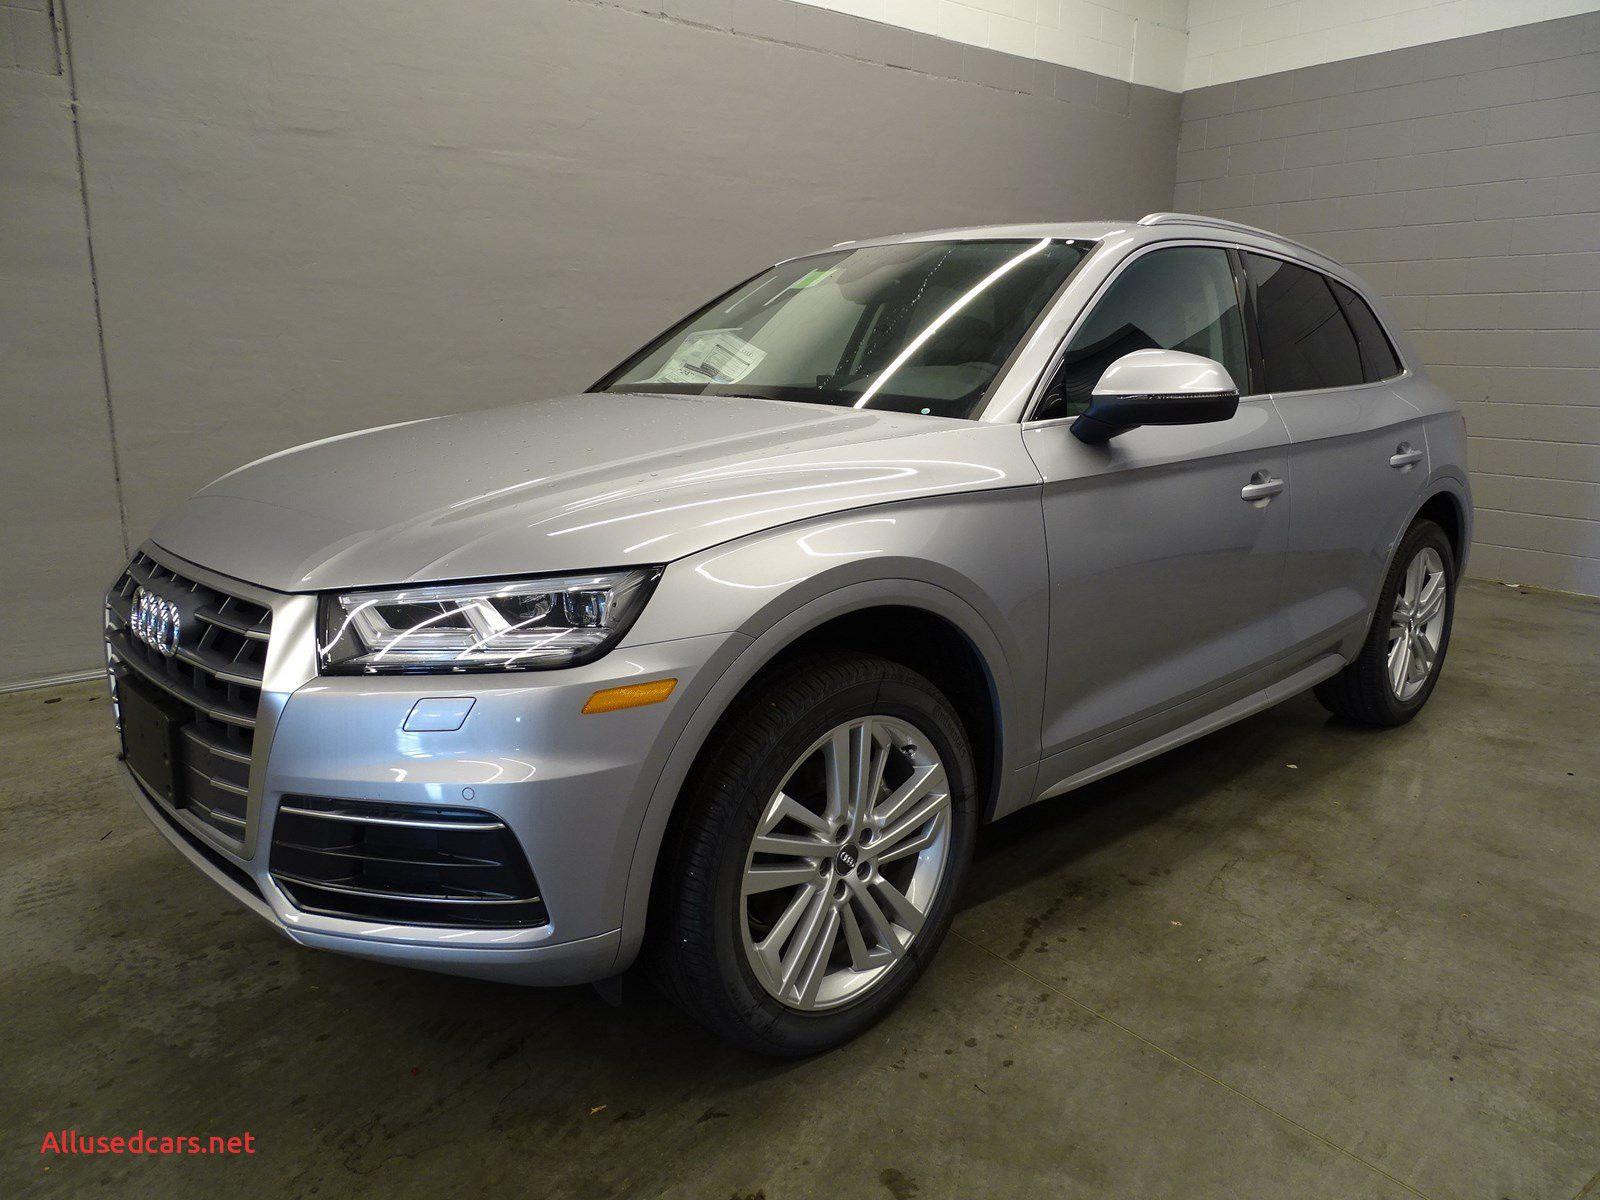 used cars toledo ohio under $10 000